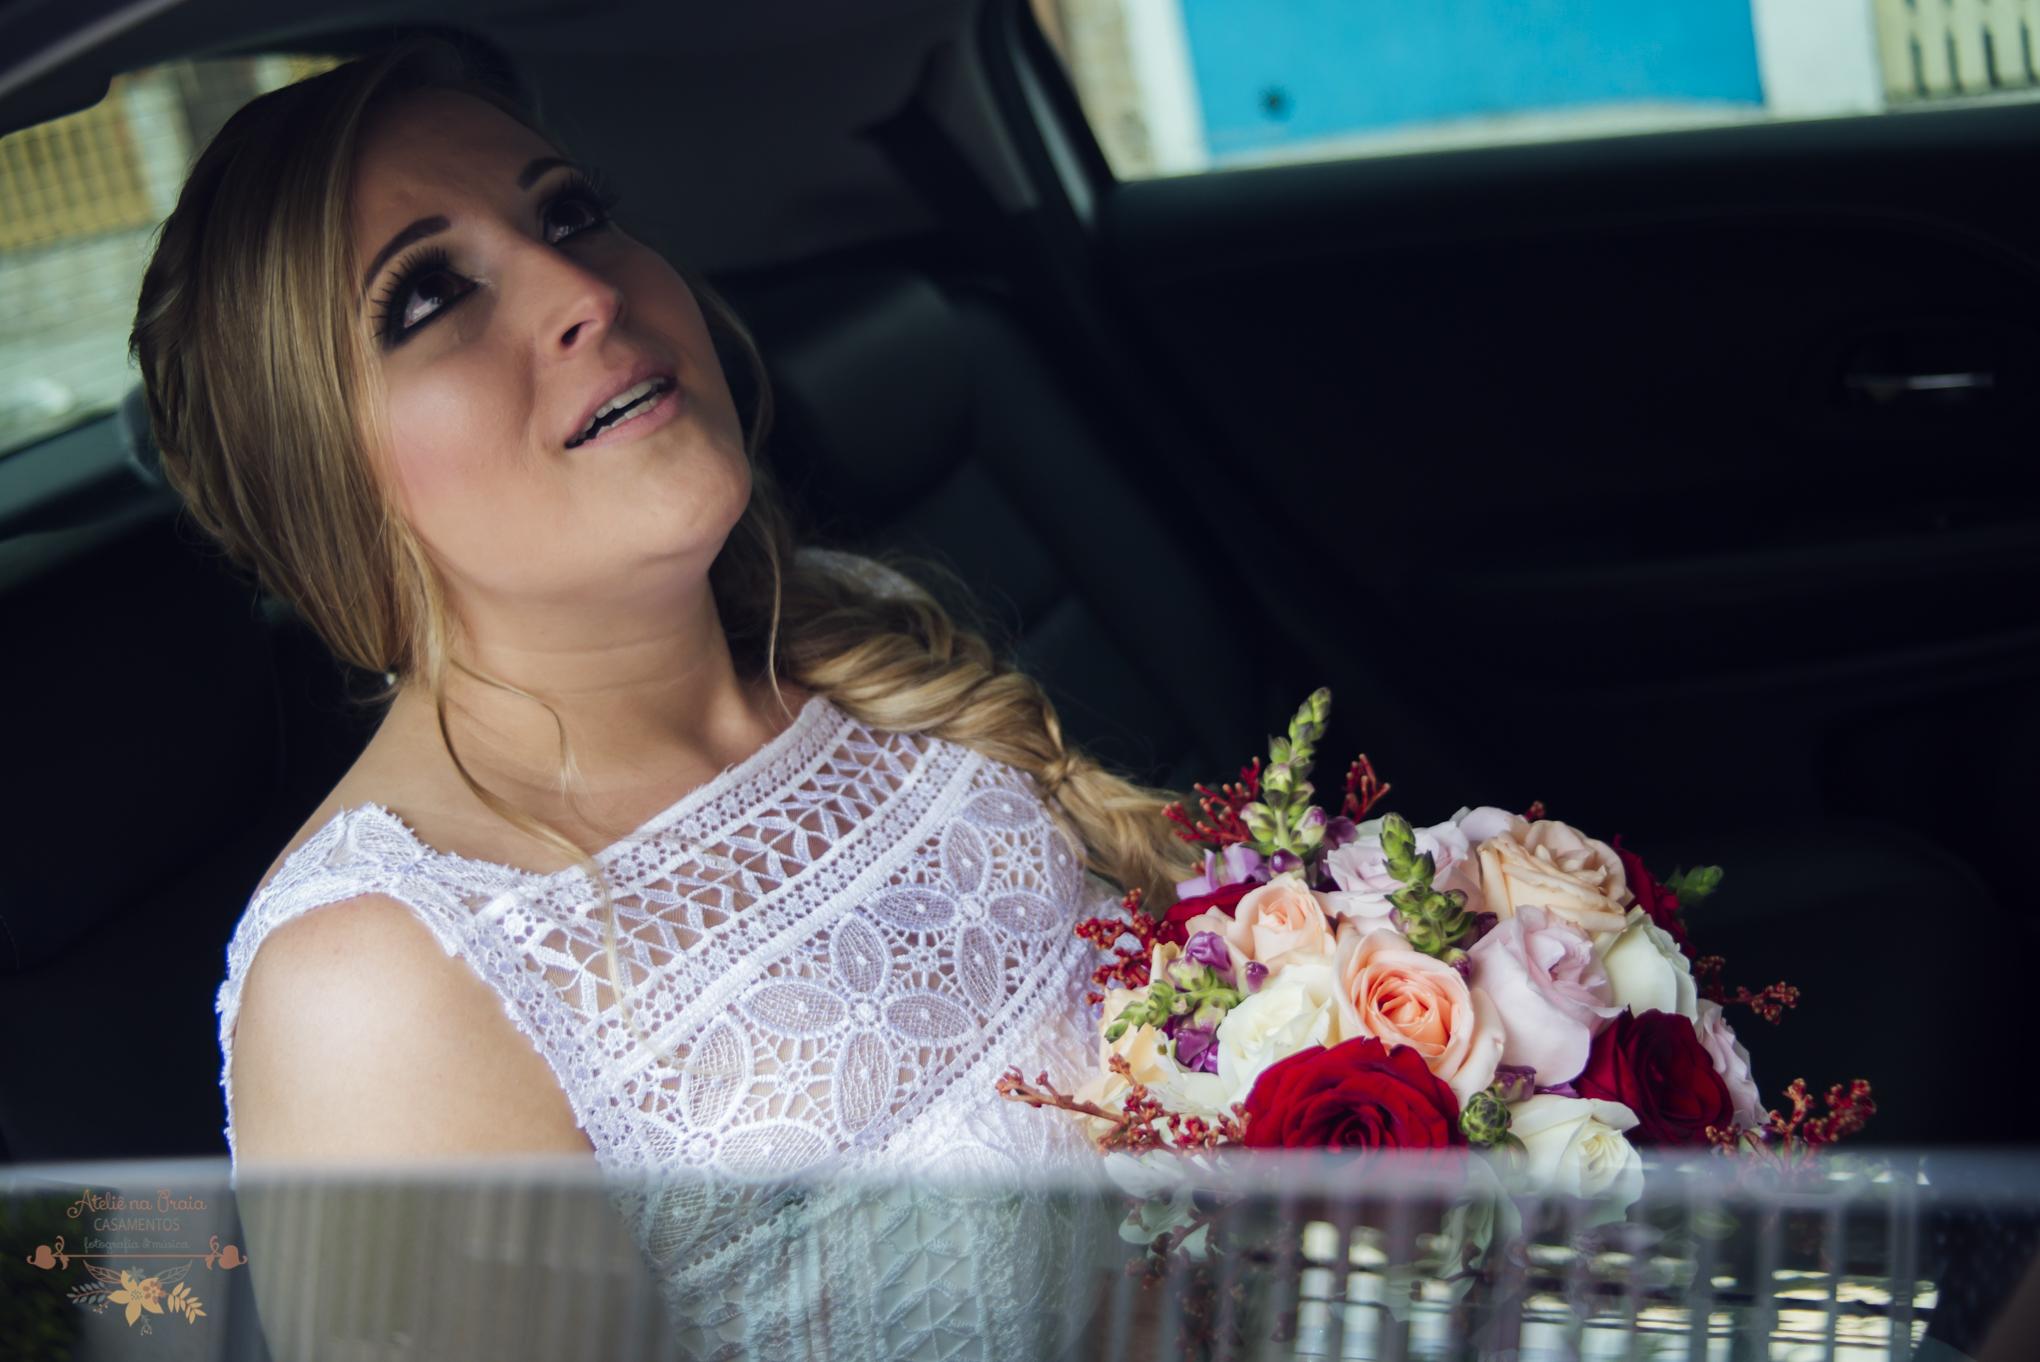 04-Cerimonia-Atelie-na-Praia-Casamento-na-Praia-Erica-Daniel-7223